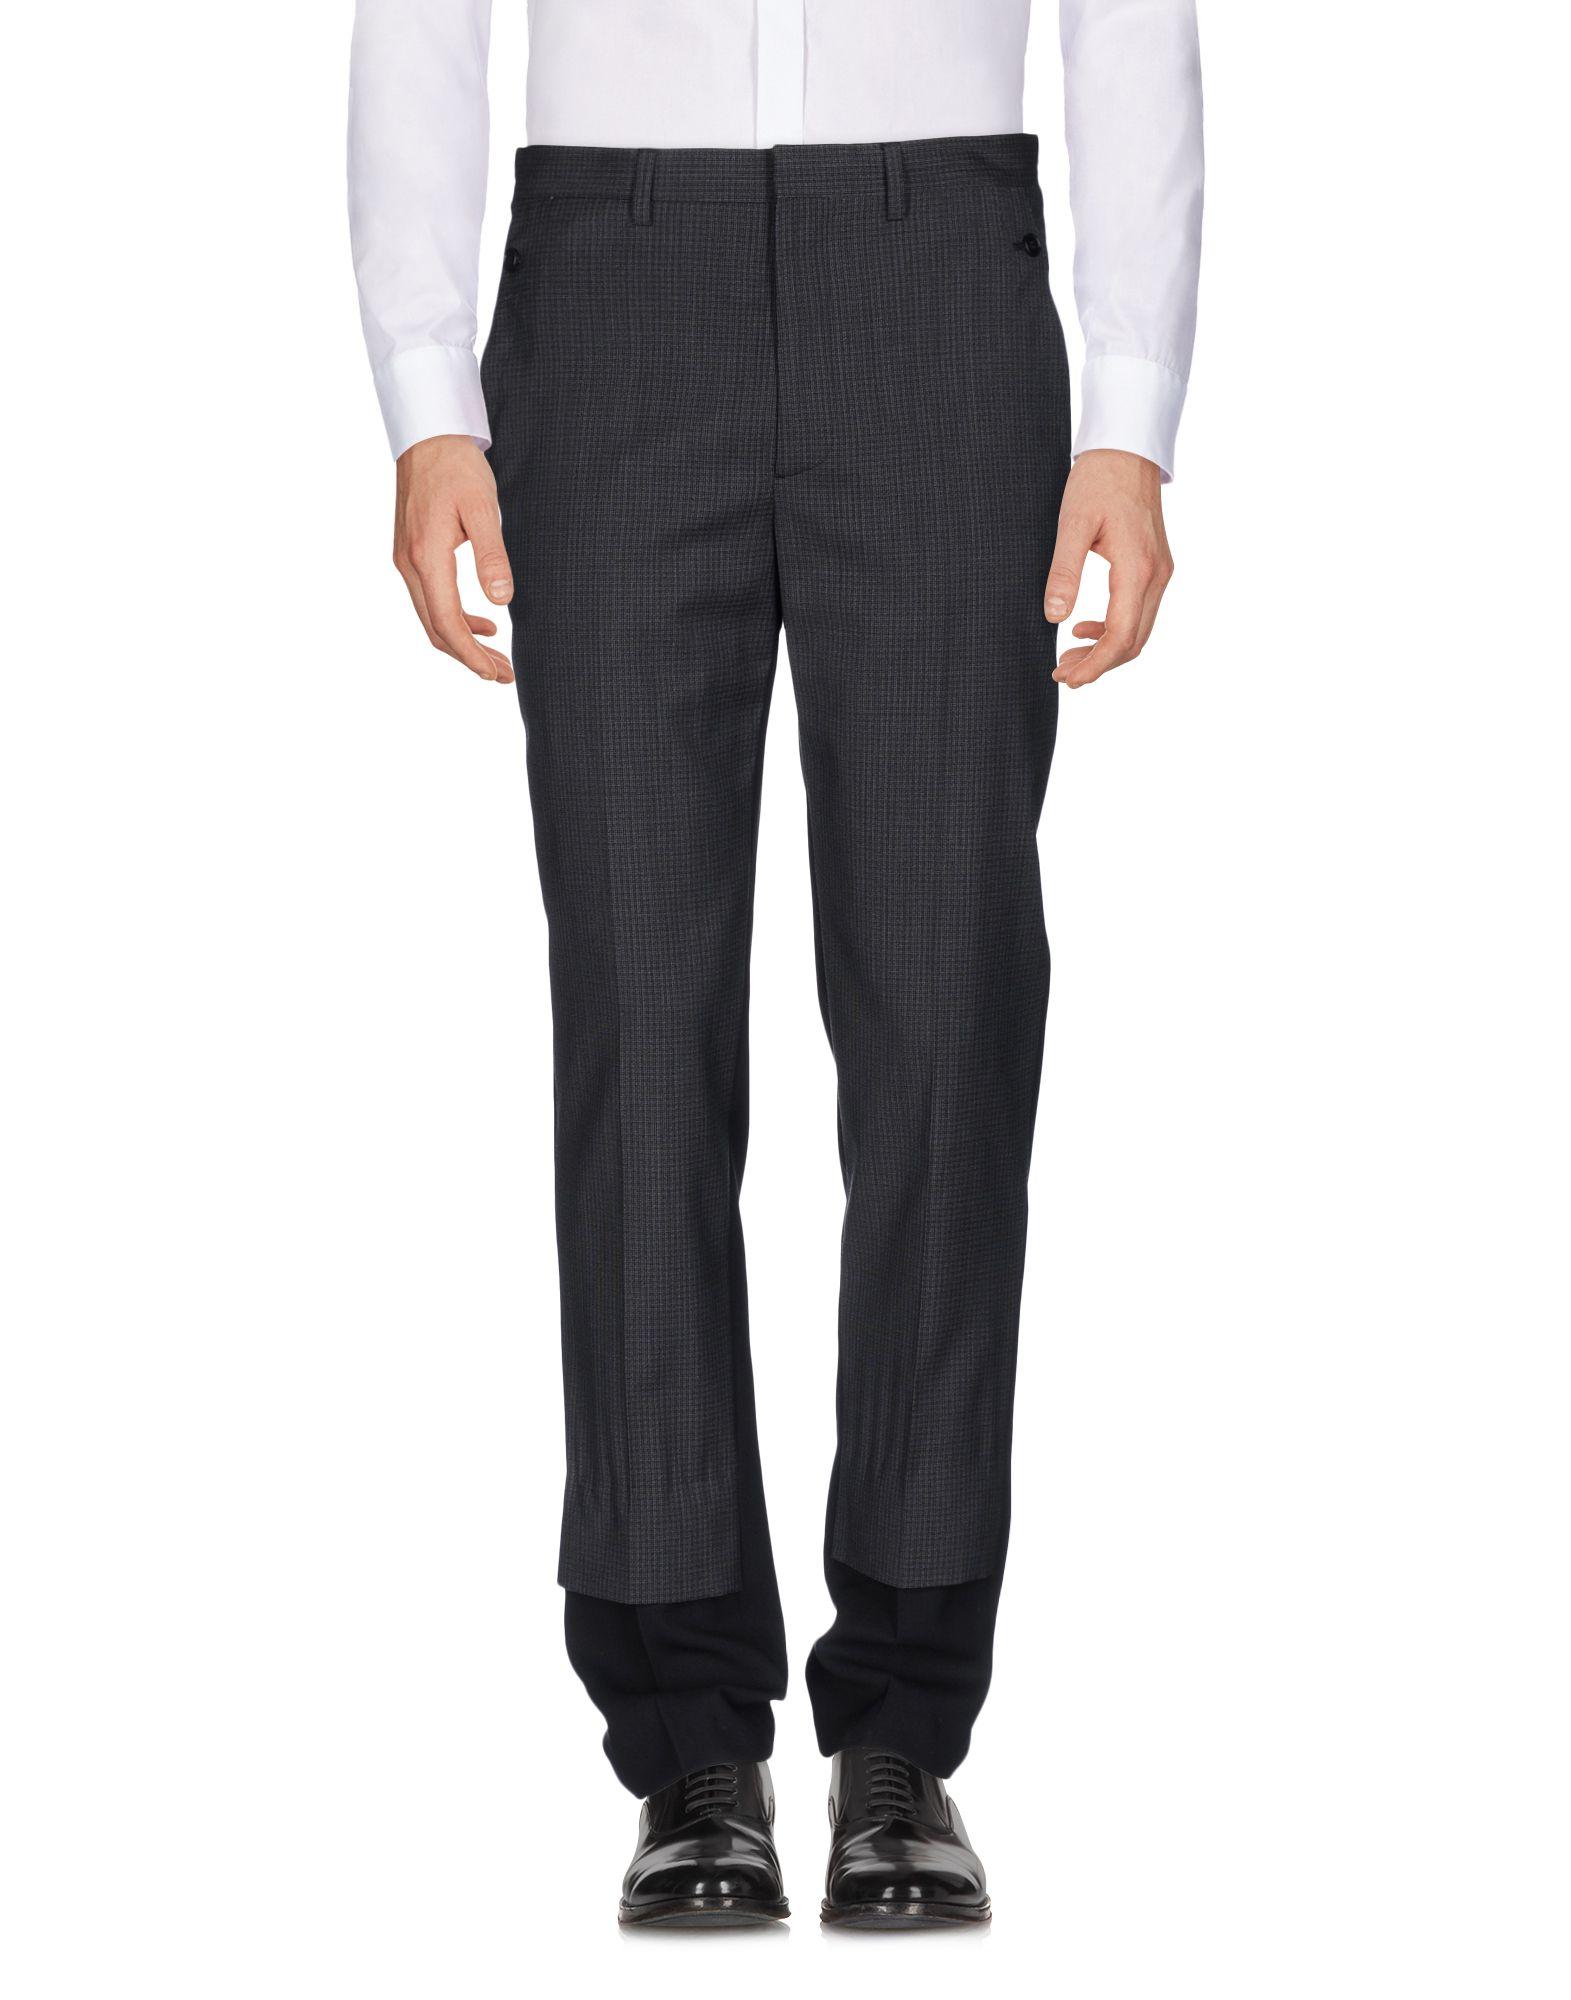 Pantalone Maison Margiela Uomo - Acquista online su